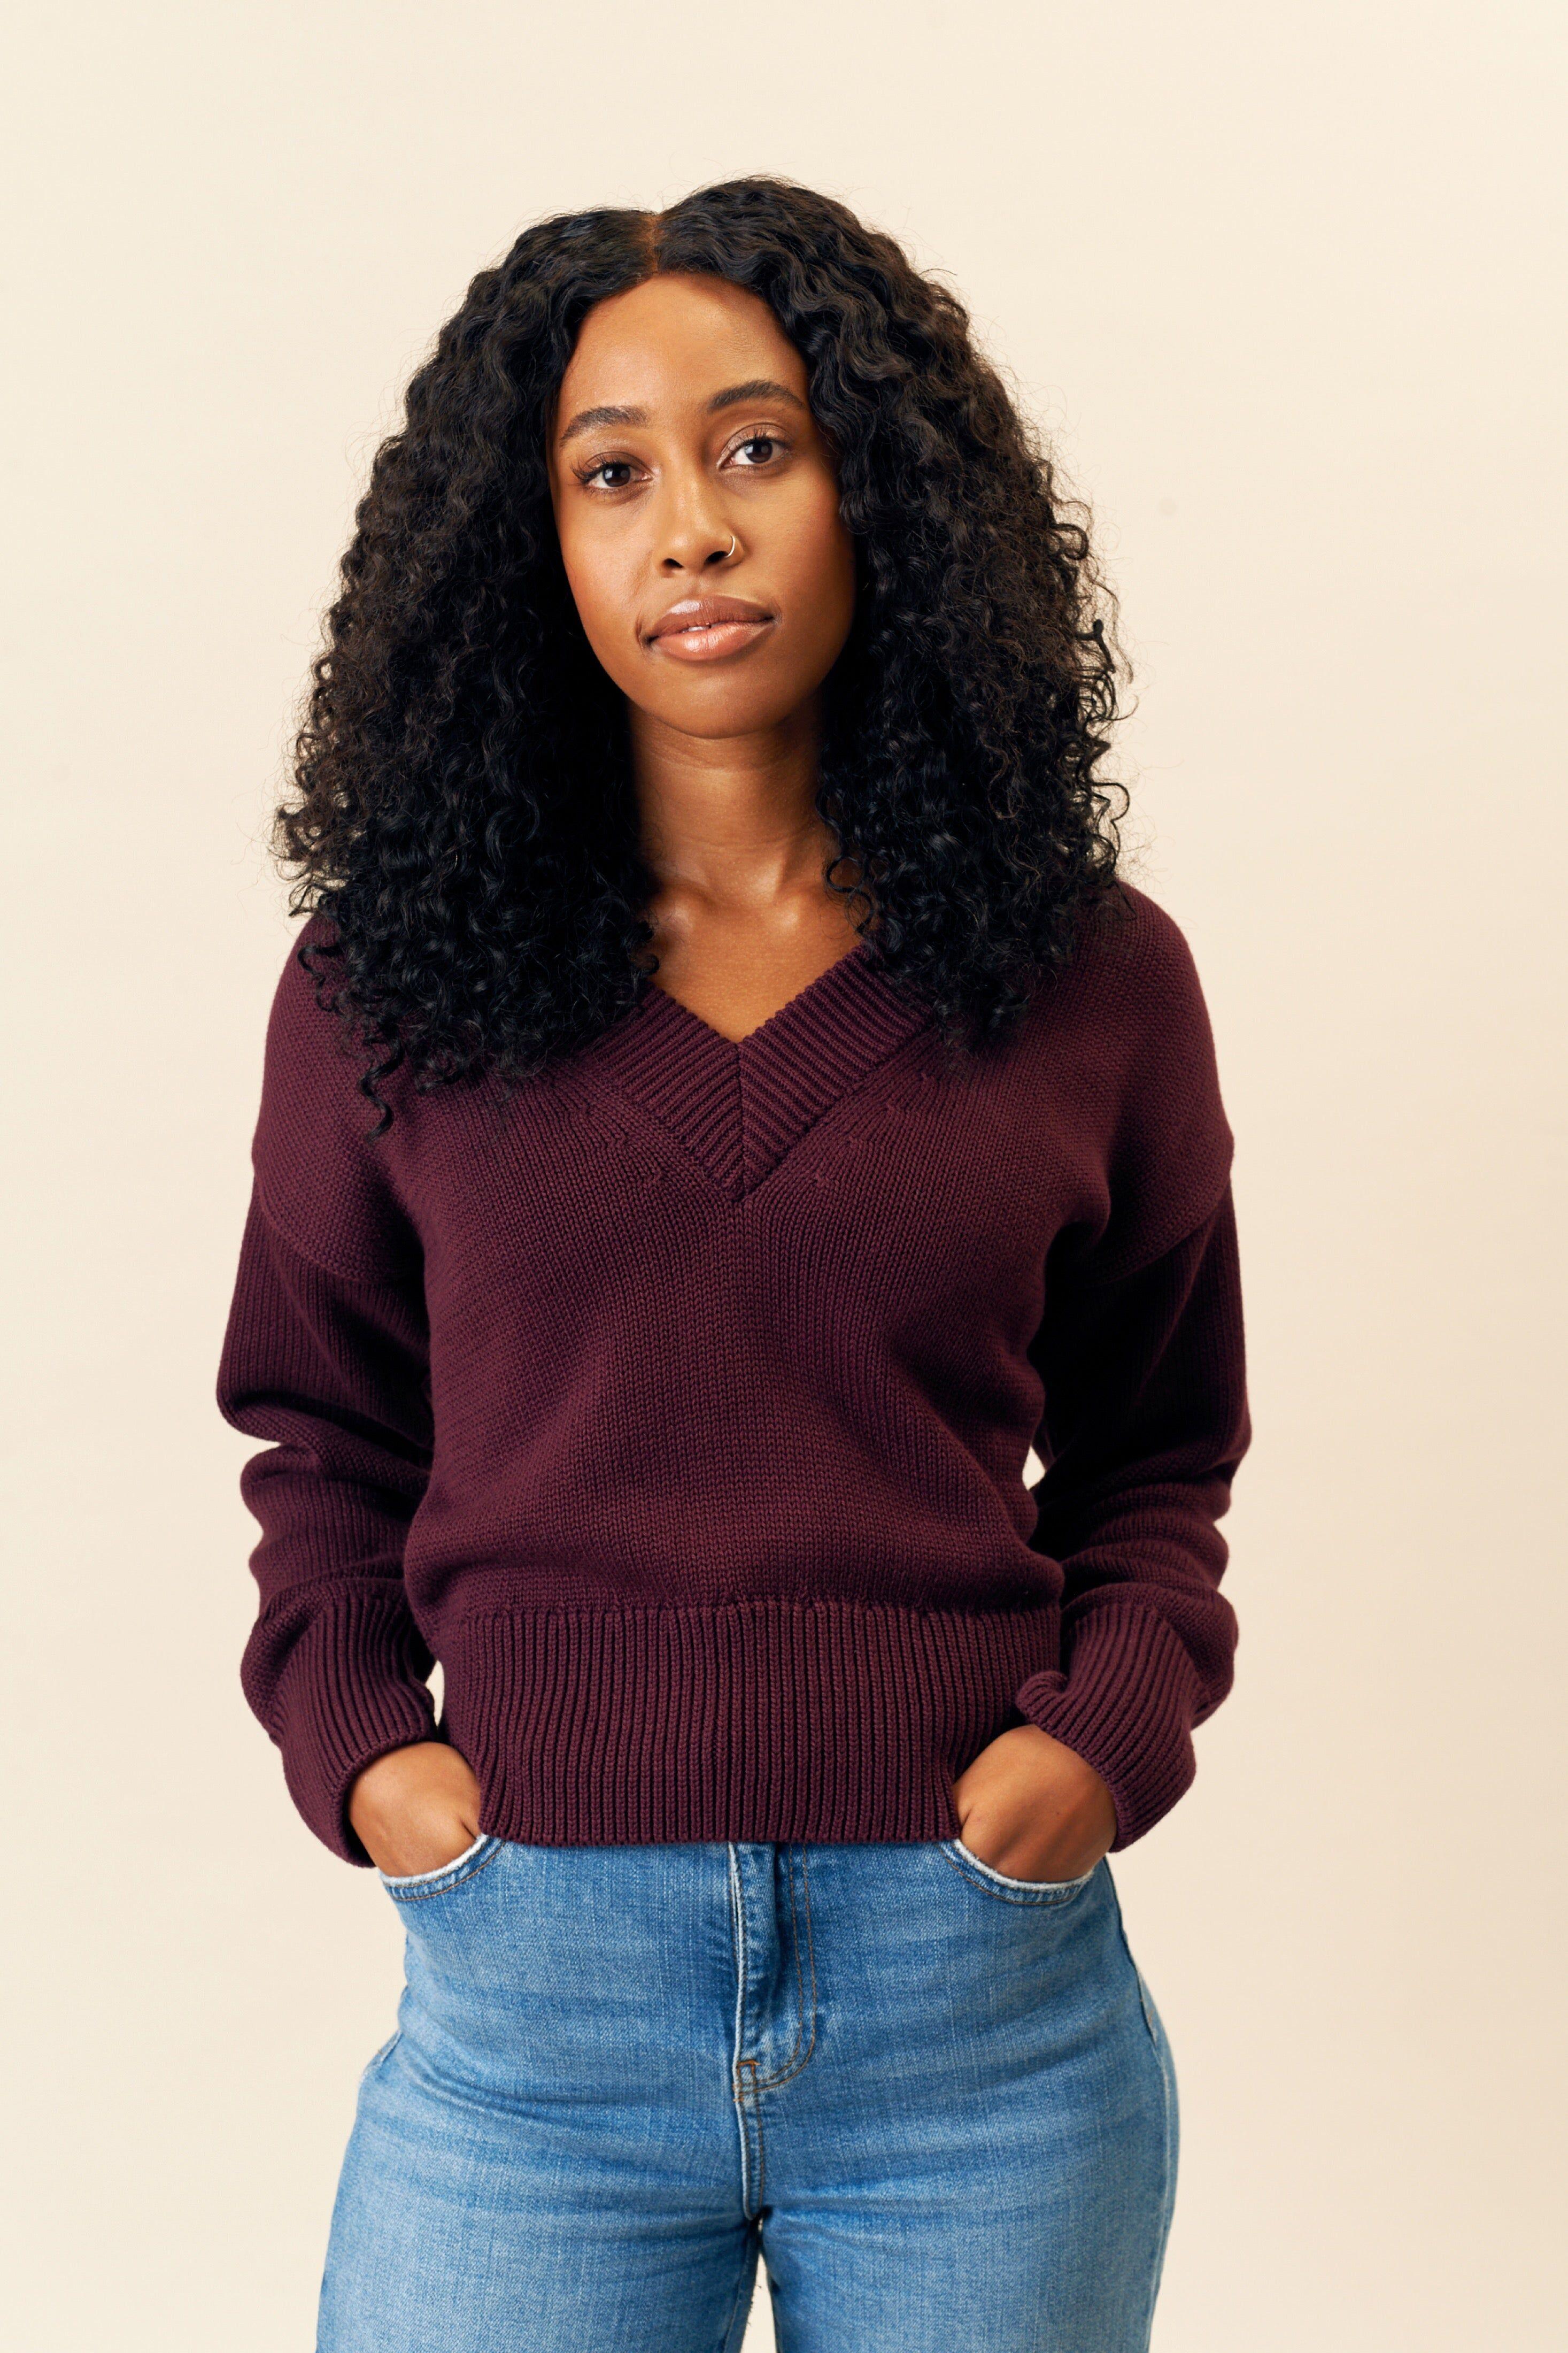 Kotn Women's Deep V-Neck Sweater in Eggplant Purple, Size XS